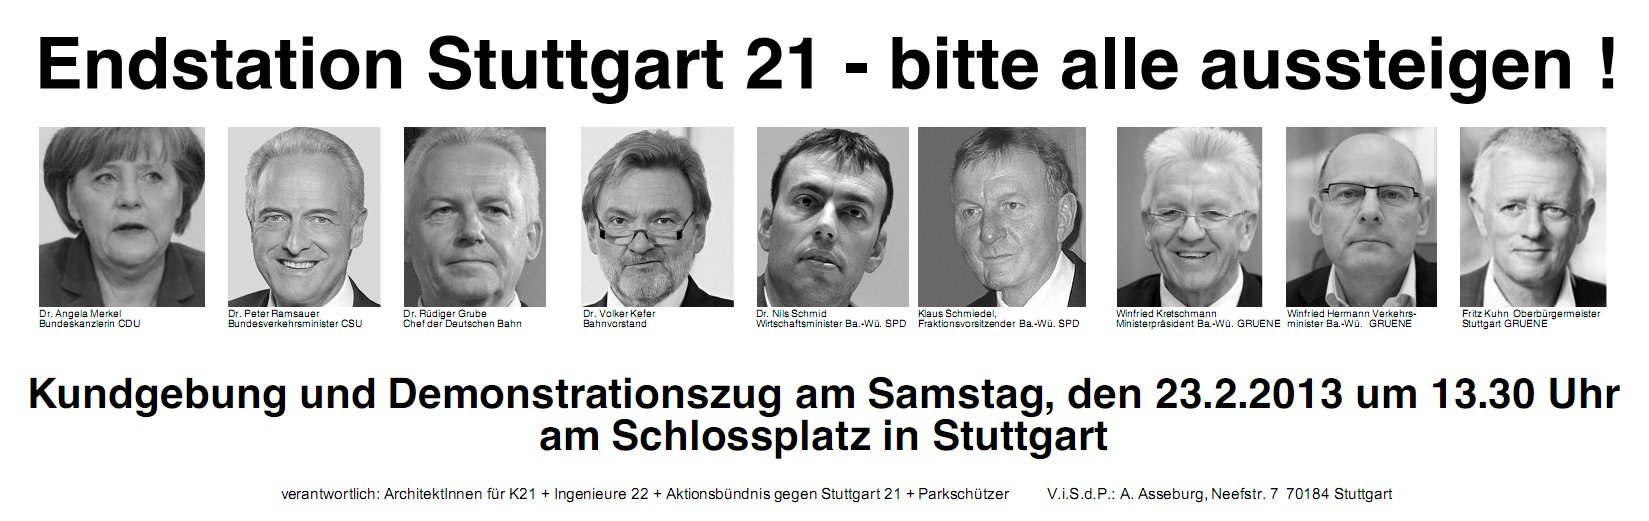 endstation-s21-Aufruf.130201